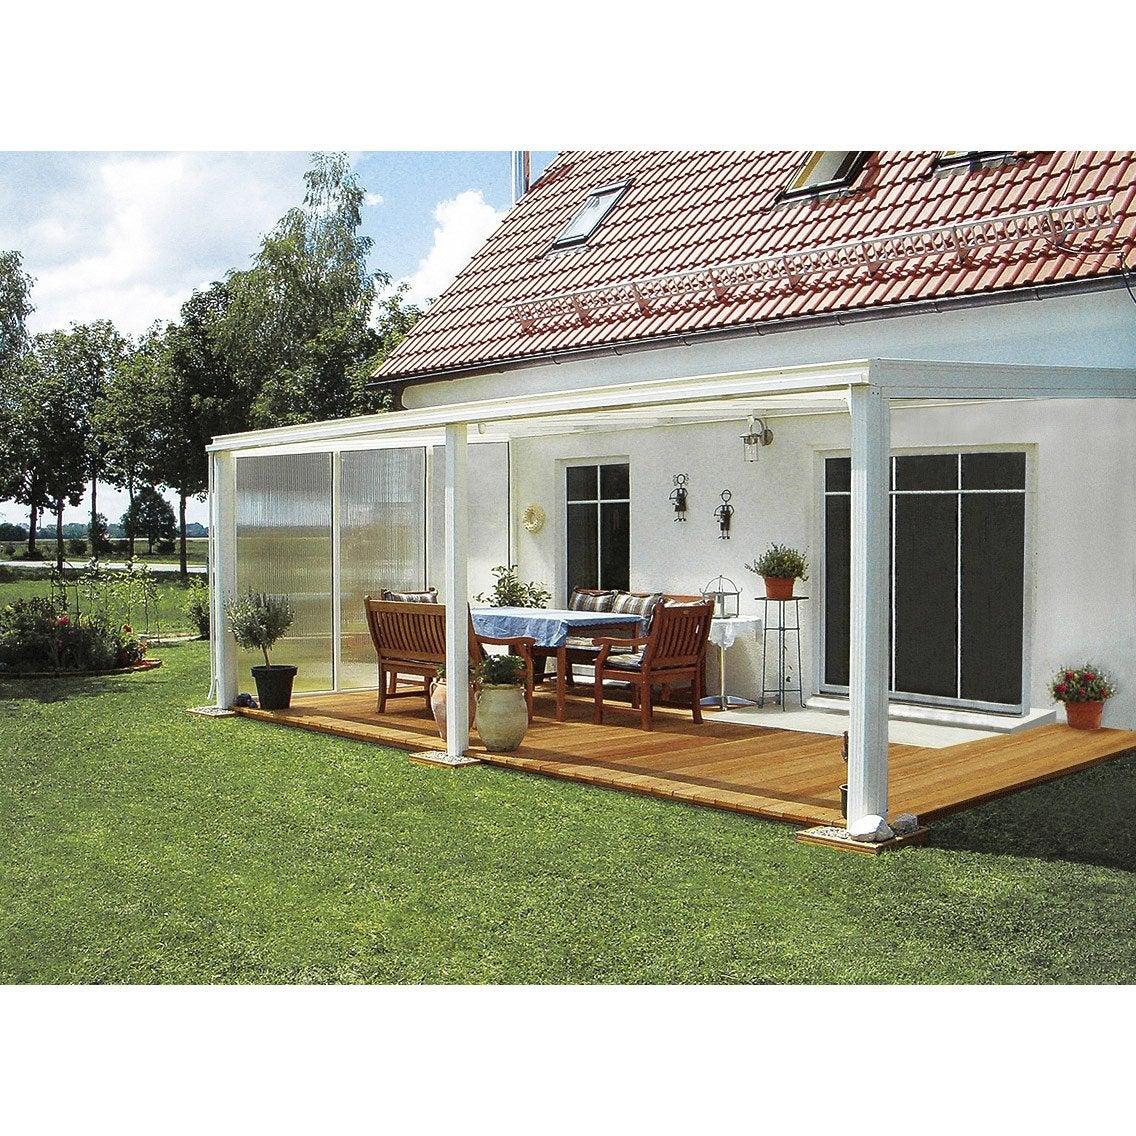 Paroi fixe avec fixations pour toit de terrasse tdkw tdow ideanature leroy merlin - Terras leroy merlin ...